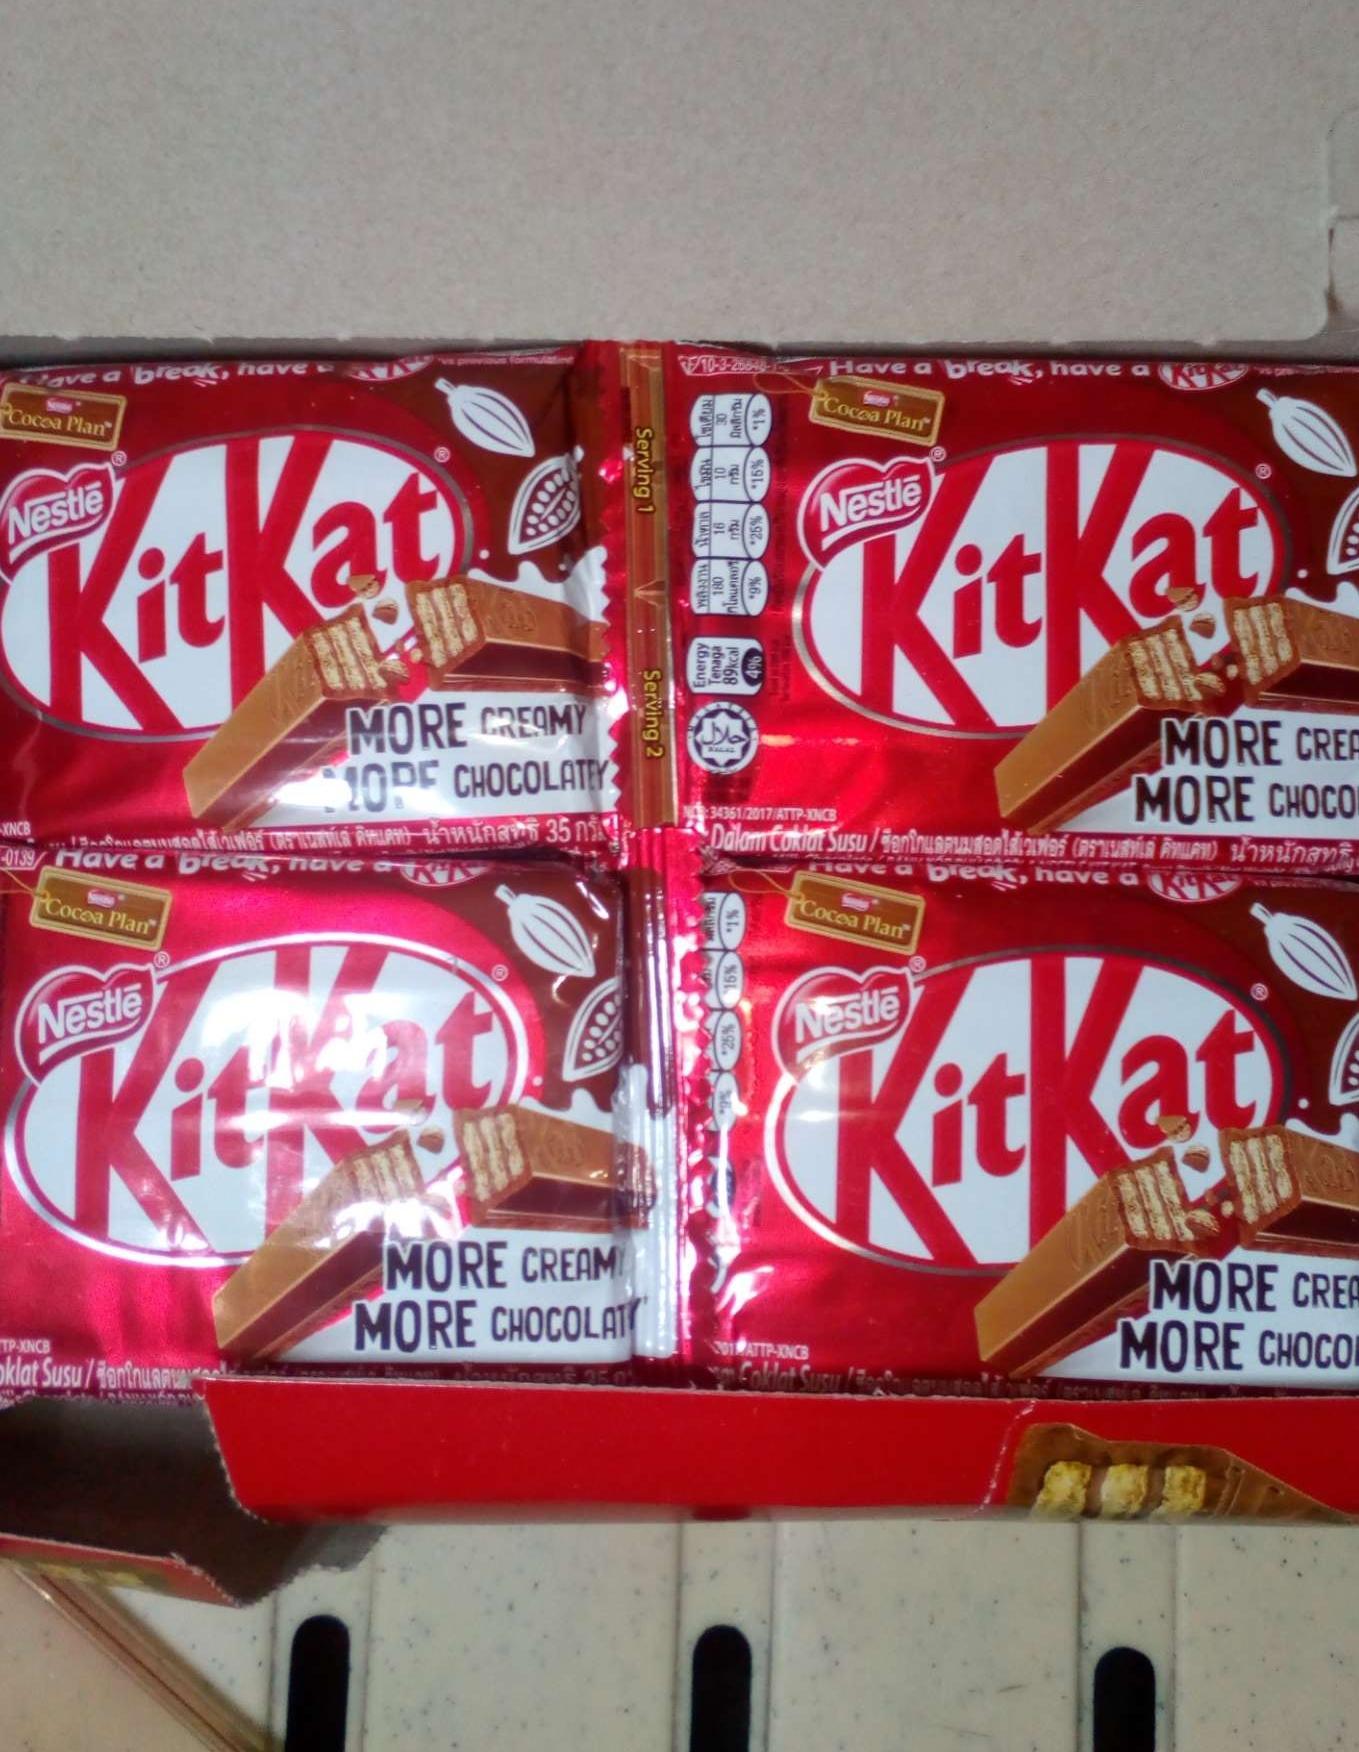 Candies Brands Chocolates On Sale Prices Set Reviews In Makarimshirt Coklat Susu Kitkat 4f